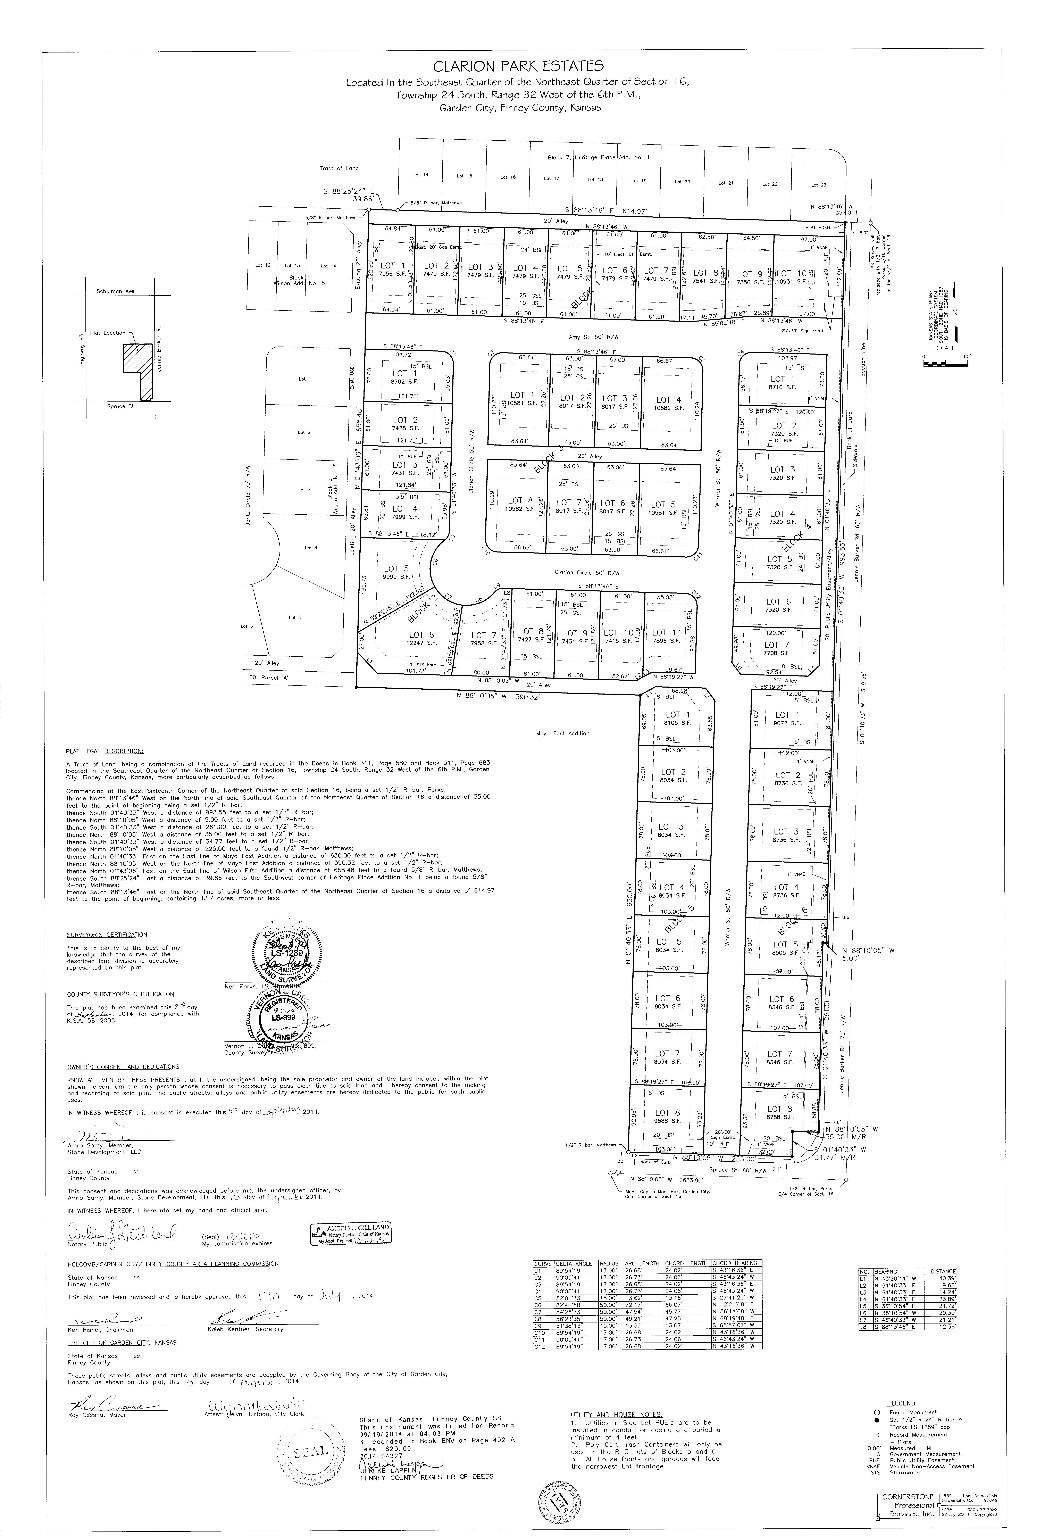 https://0201.nccdn.net/4_2/000/000/083/84e/1629-clarion-park-estates-filed-plat.jpg